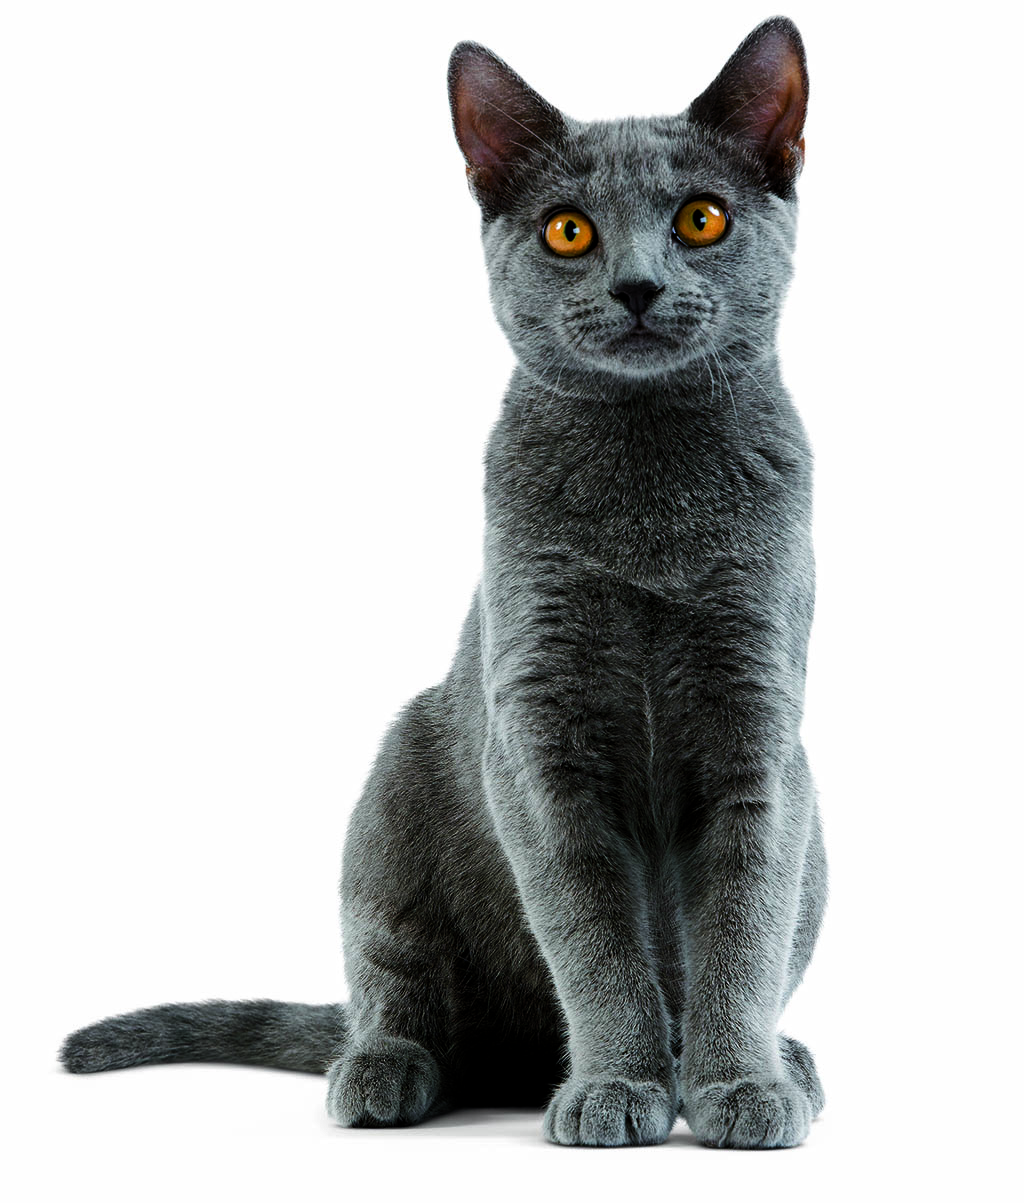 Chartreux Cat: Chartreux Karthauzi Macska Breed